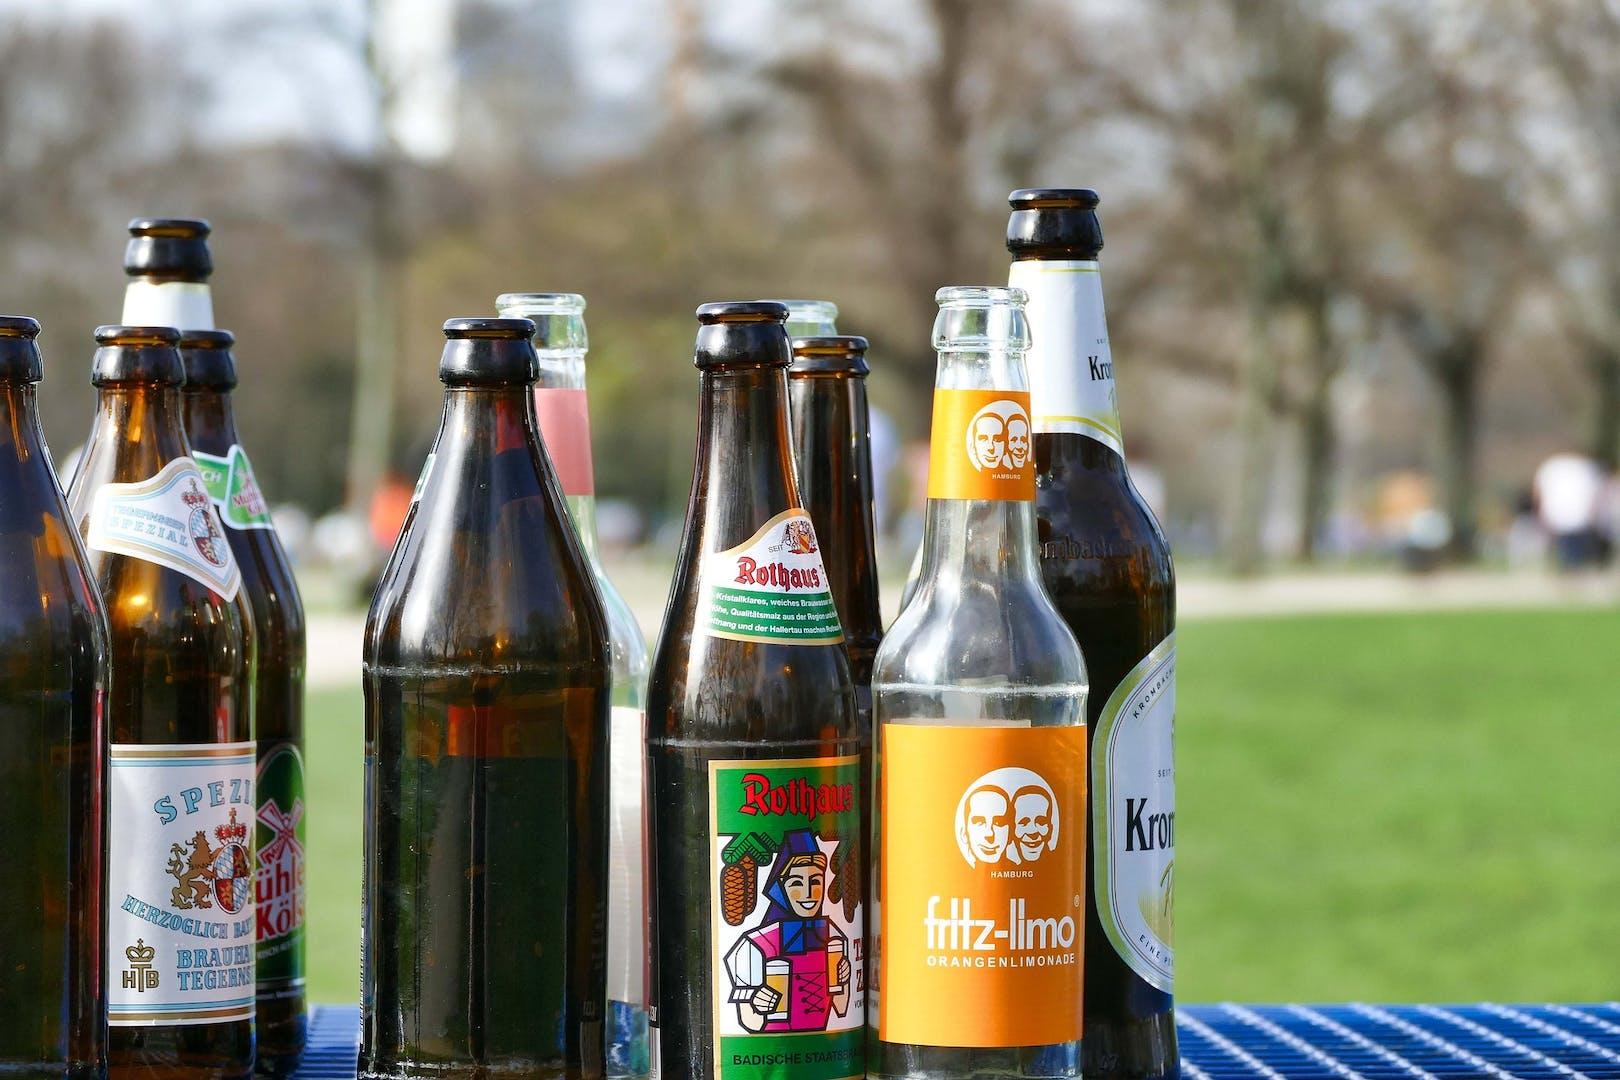 Random beer bottles arranged on a table.